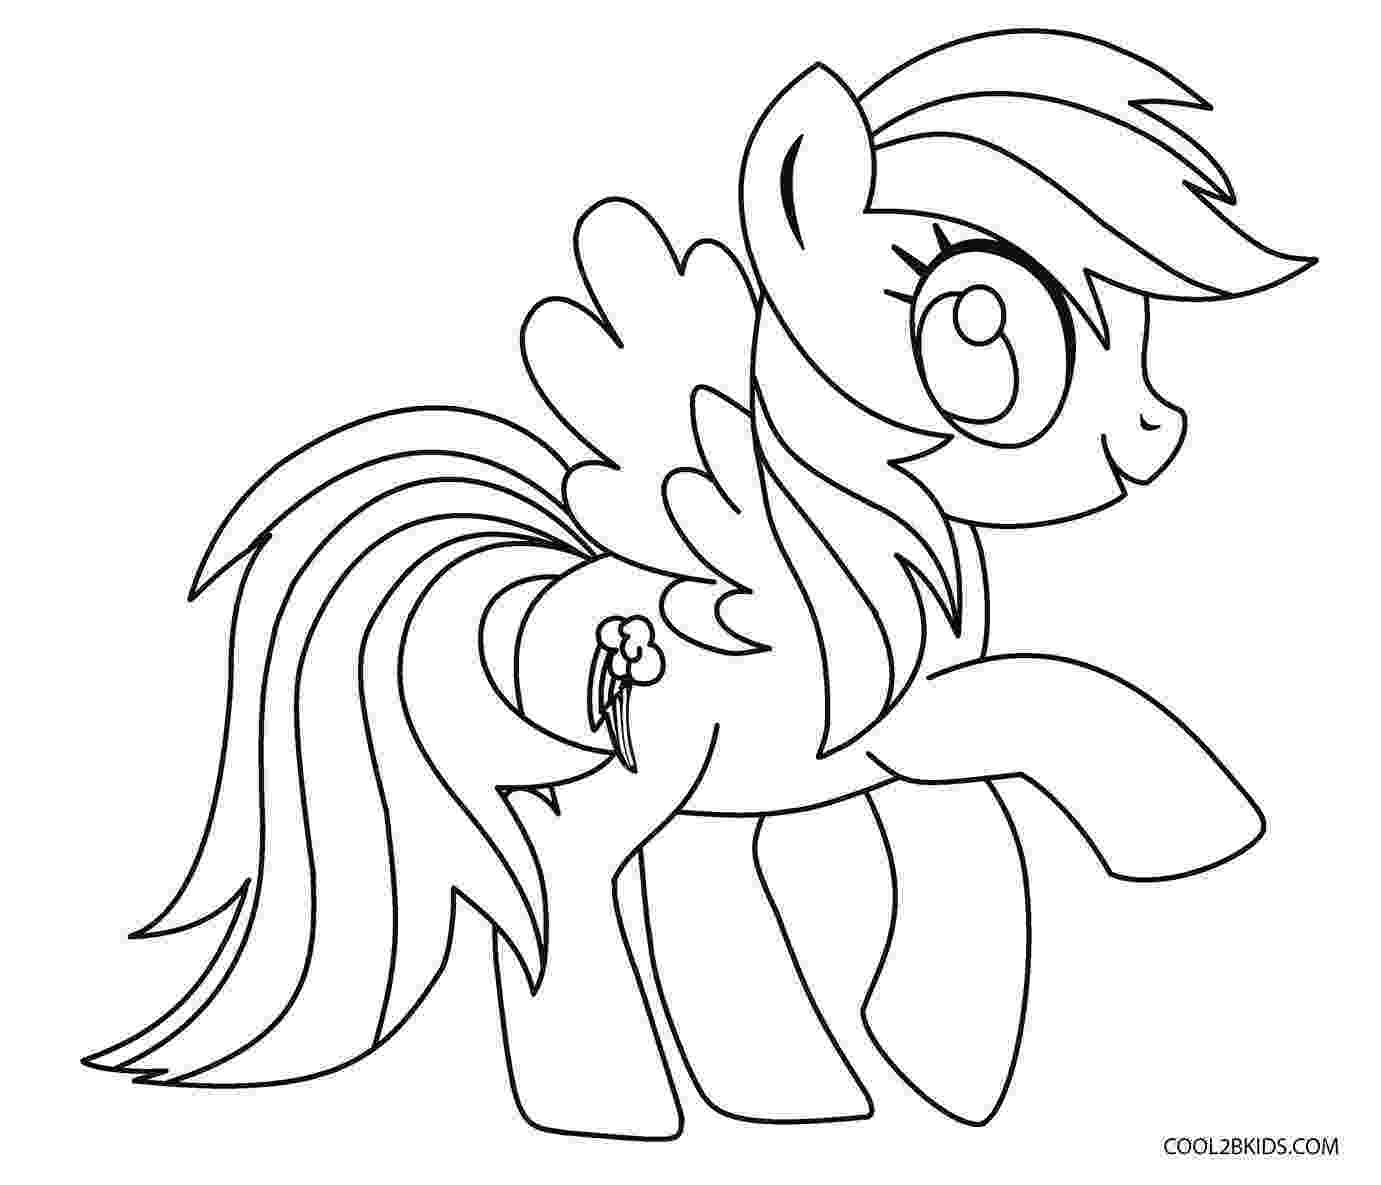 free printable my little pony my little pony girls coloring page my little pony printable my pony free little